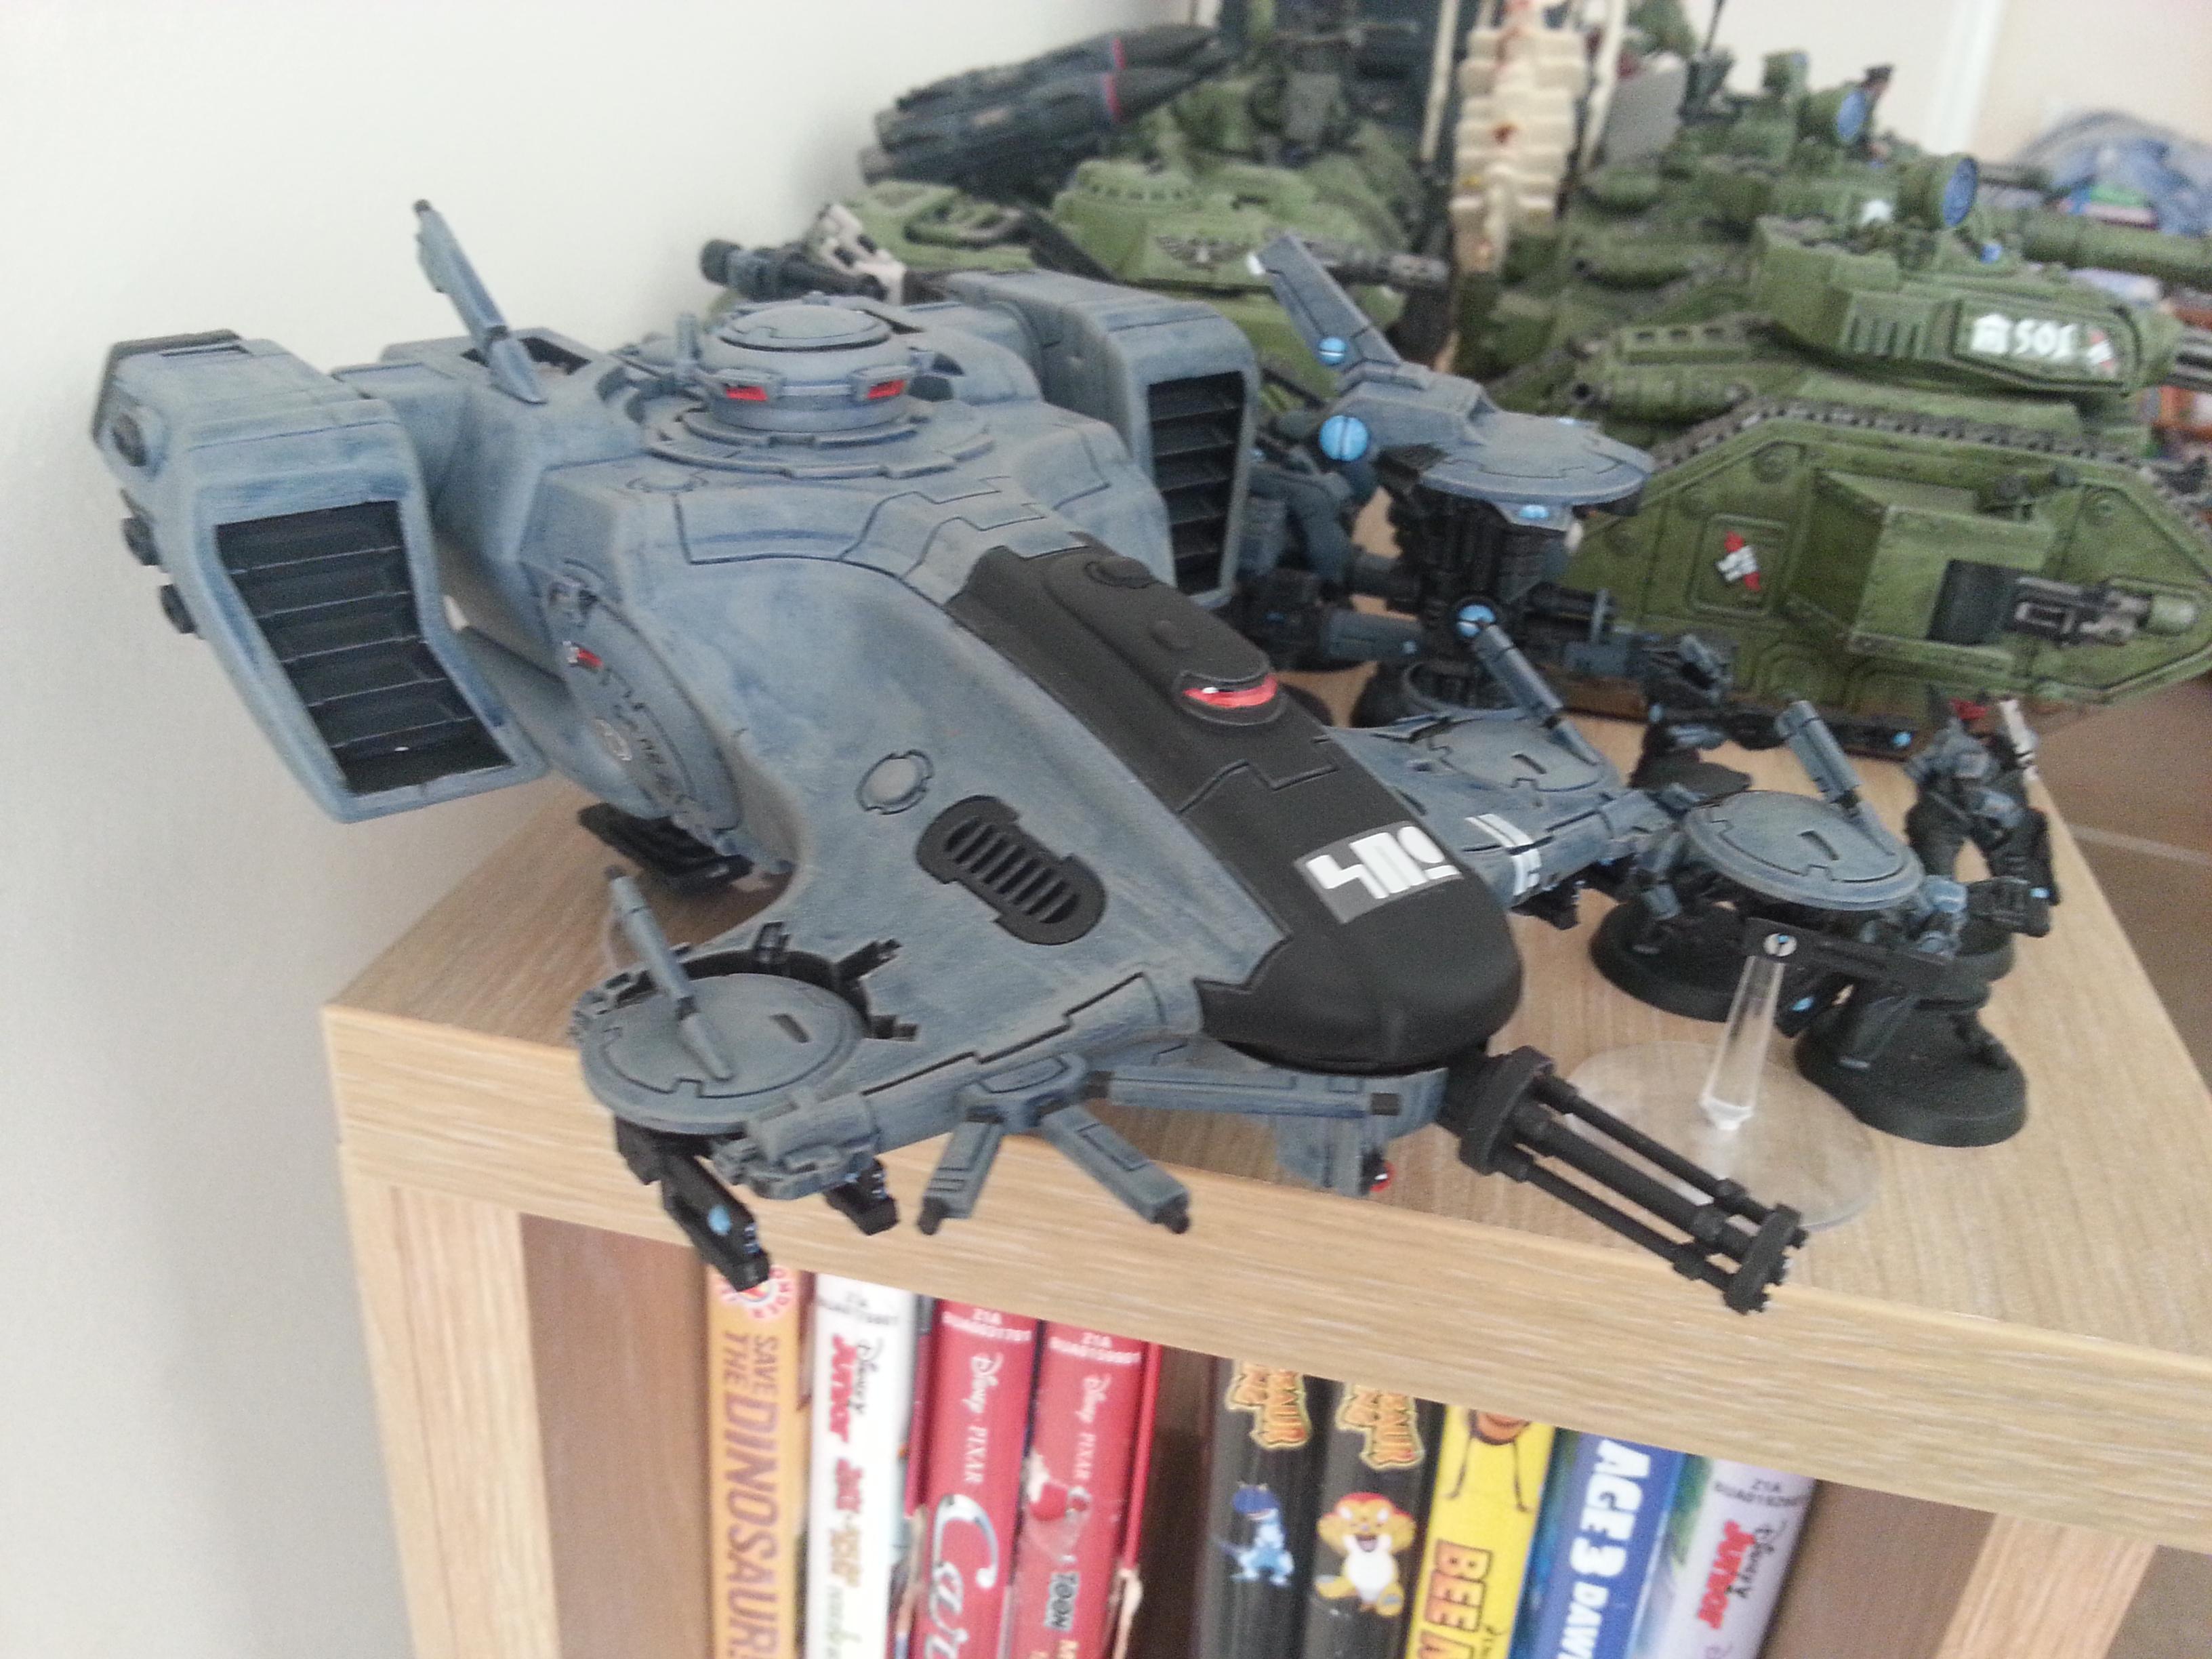 Devilfish, Drones, Pathfinders, Tau